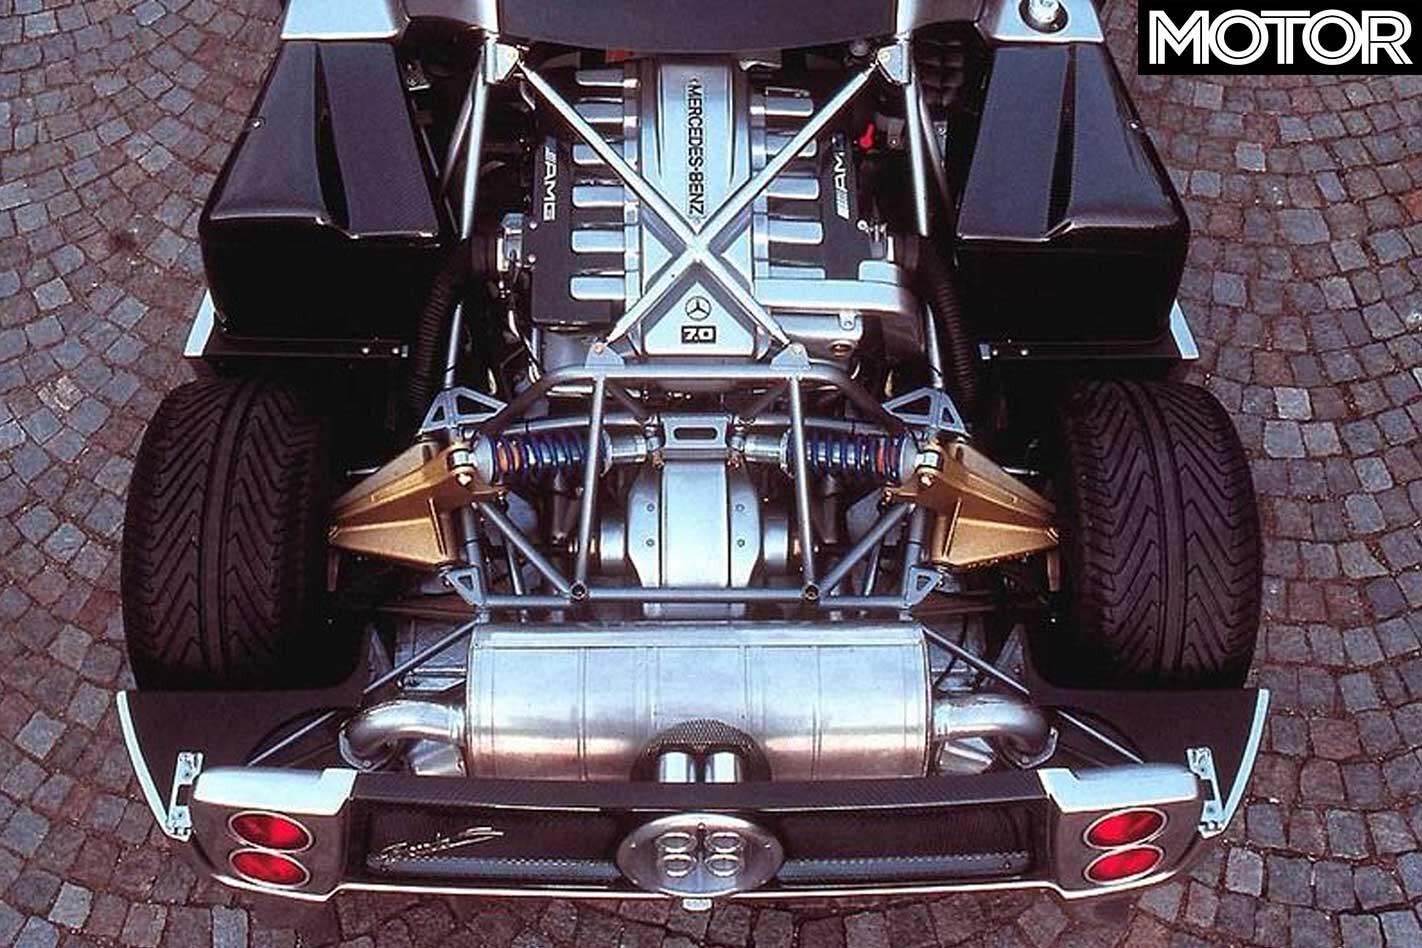 2004 Pagani Zonda C 12 S Engine Jpg